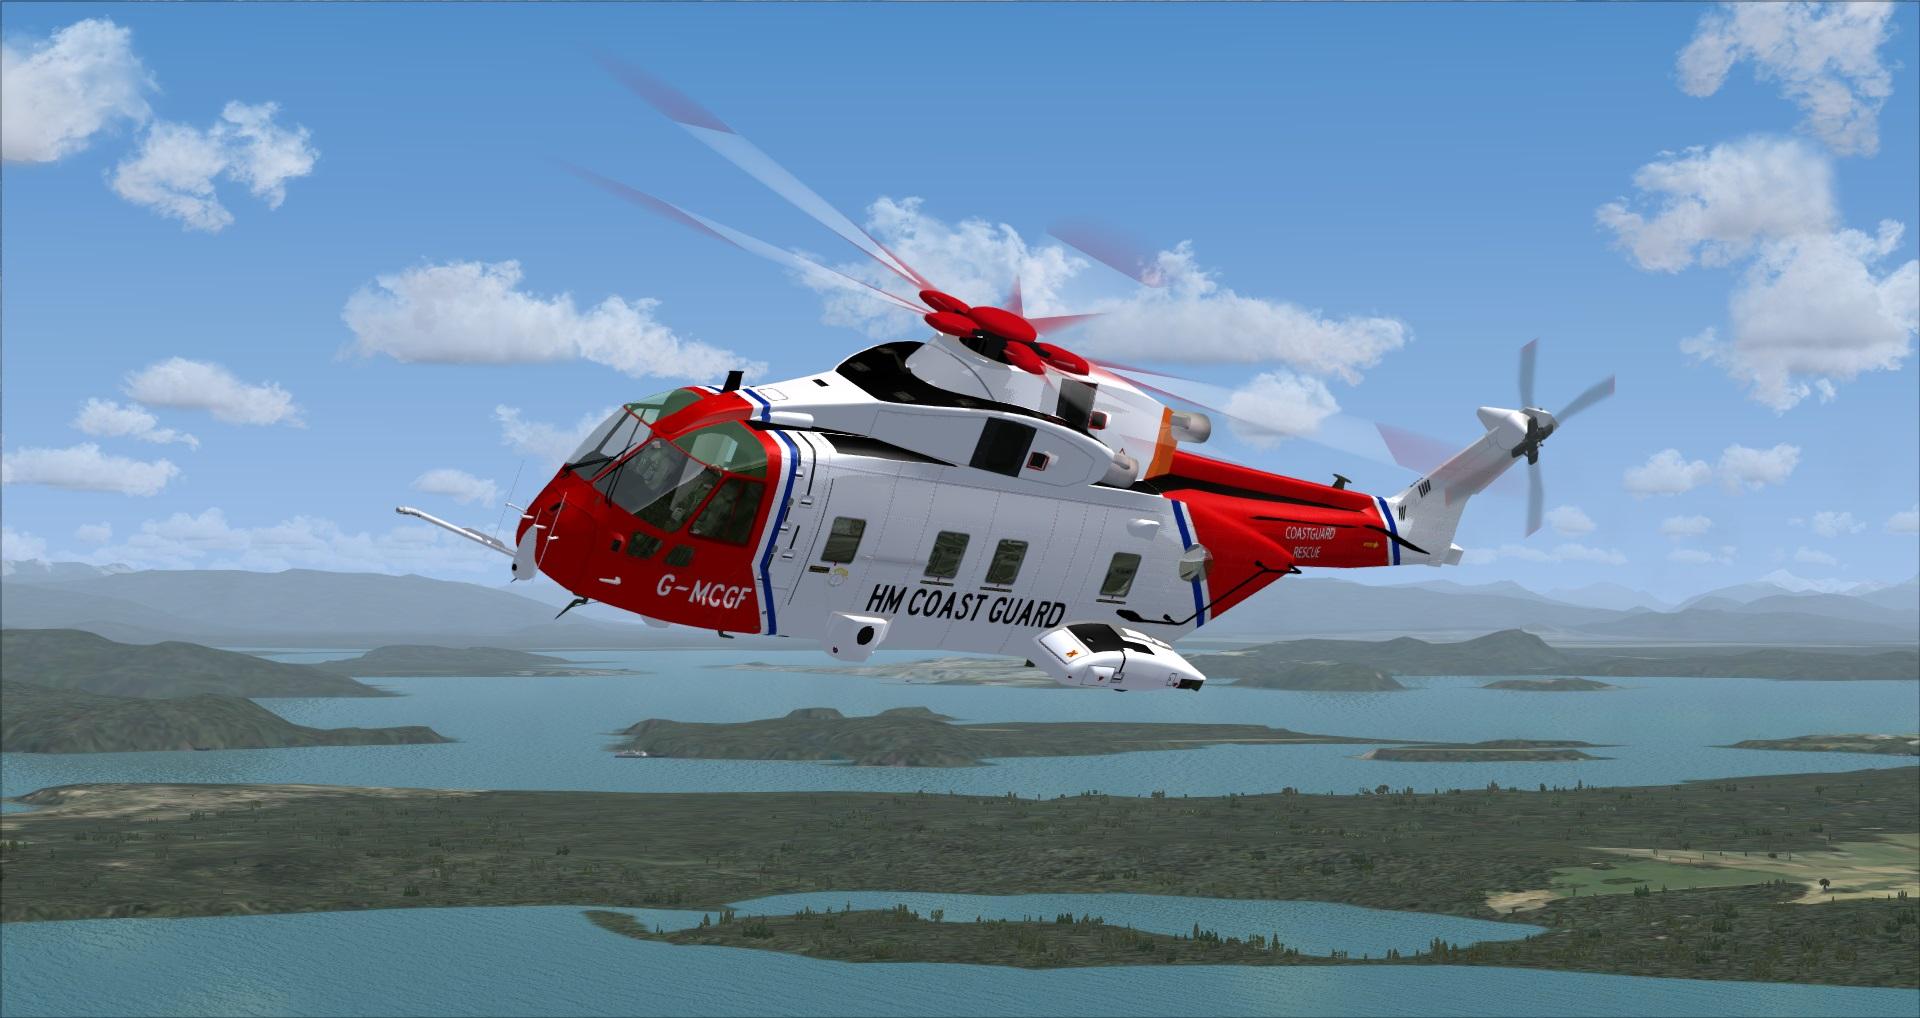 fs-freeware net - Helicopter